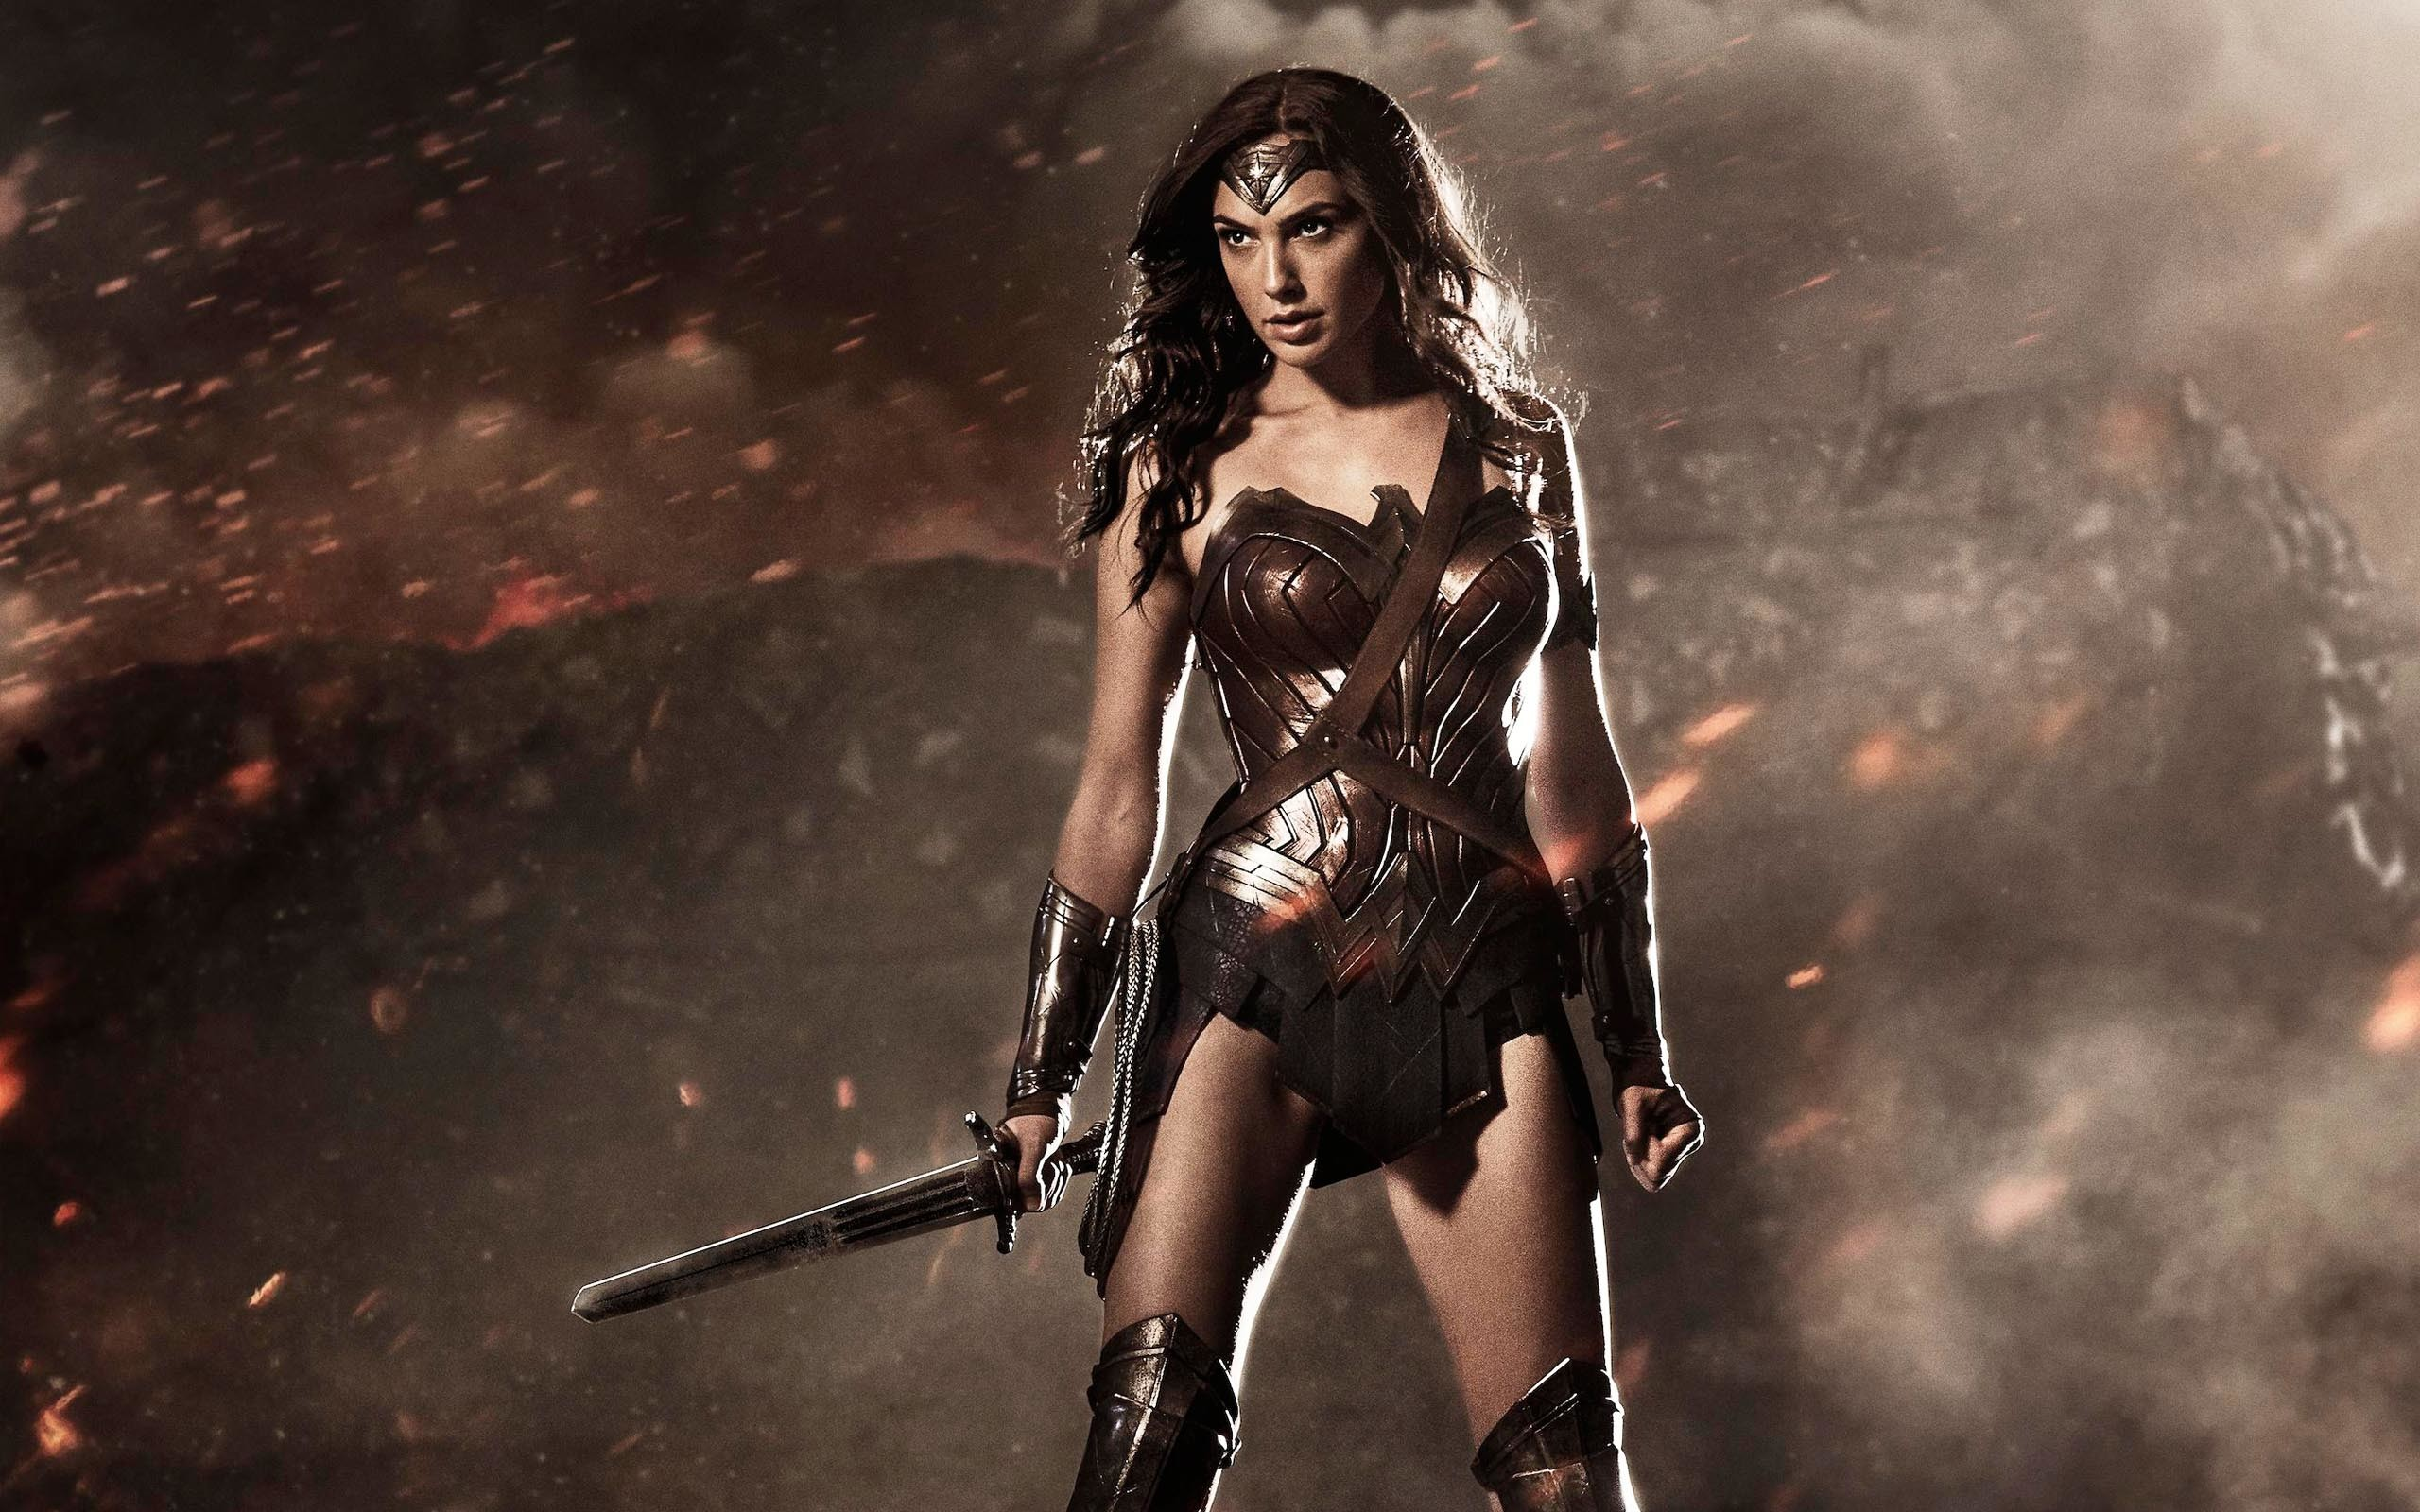 Gal Gadot Wonder Woman Movie 2017 wallpaper